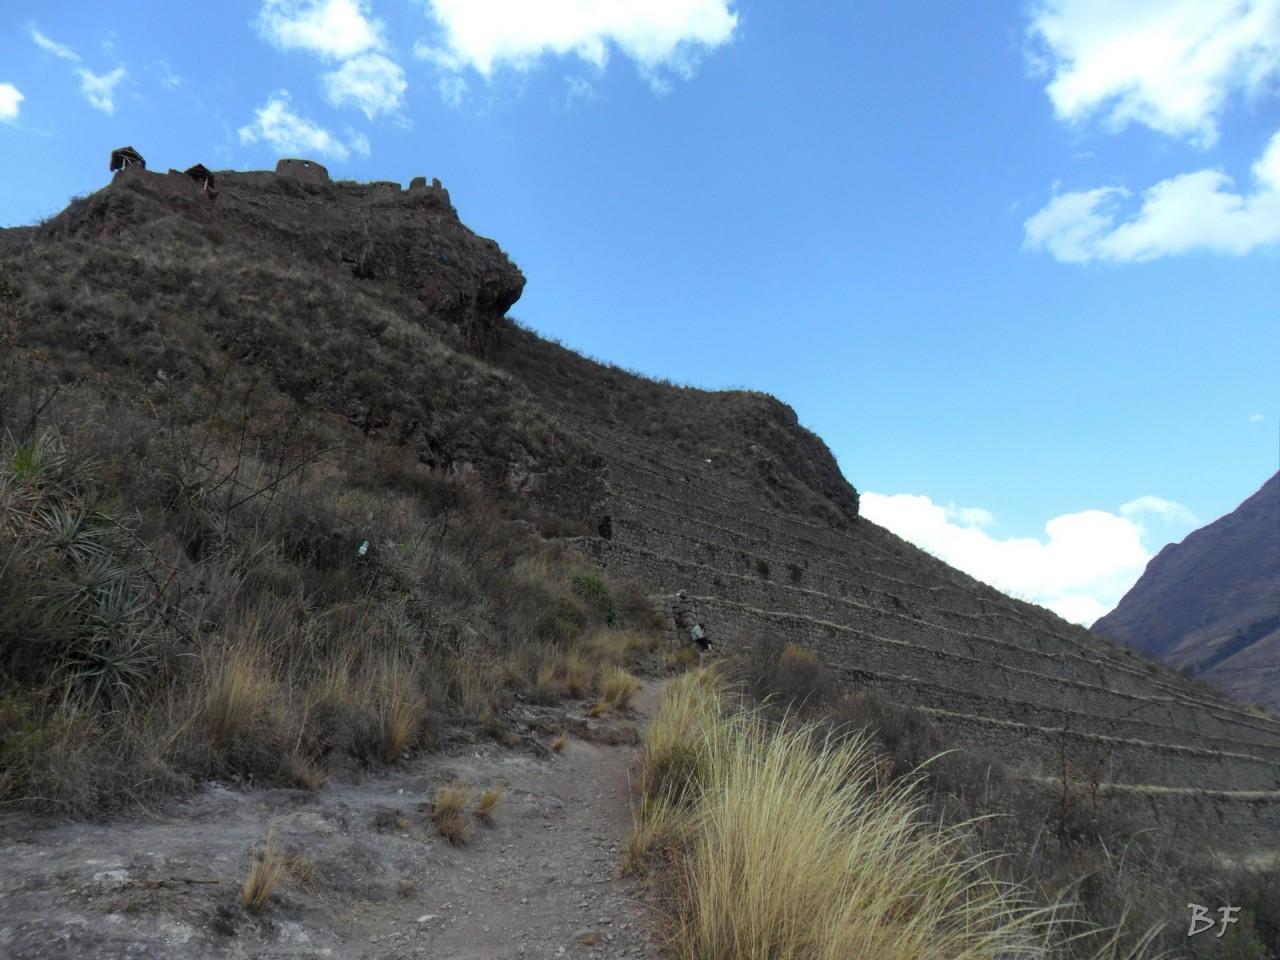 Mura-Poligonali-Megaliti-Altari-Rupestri-Pisac-Cusco-Perù-83